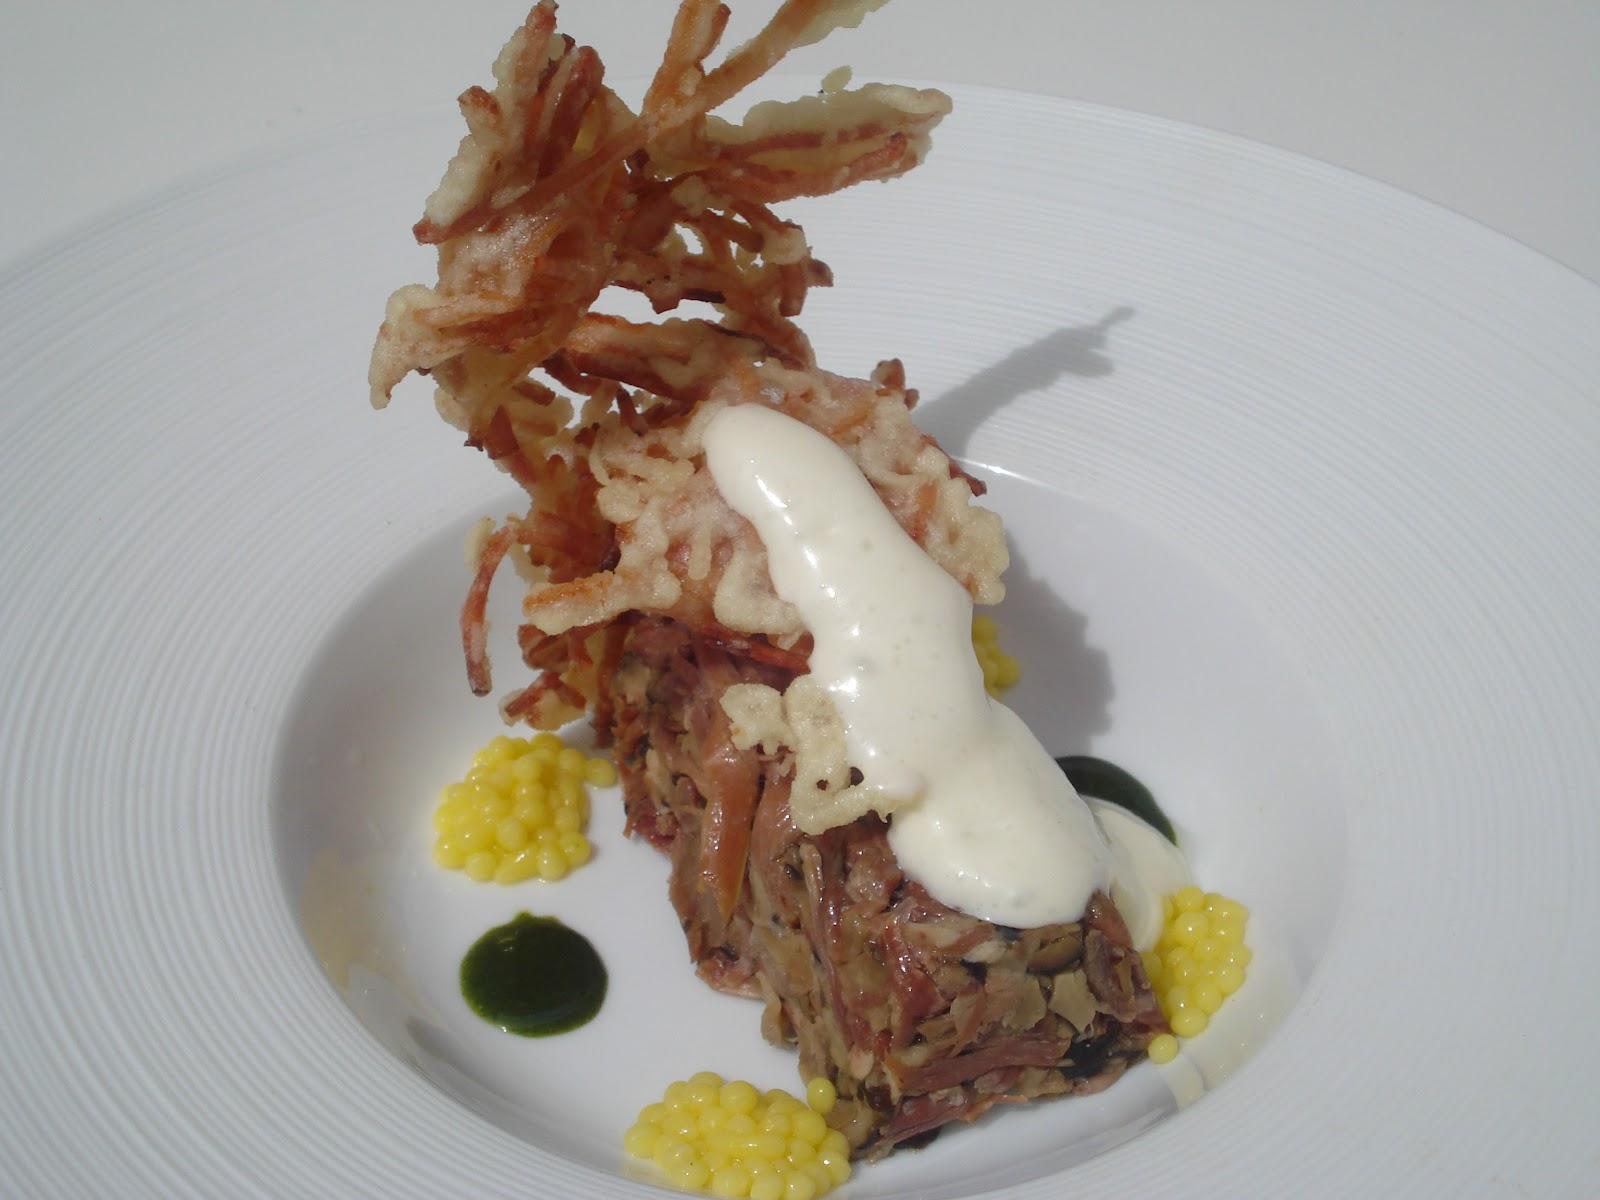 Esteban g mez platos para todo tipos de restaurante for Tipos de platos